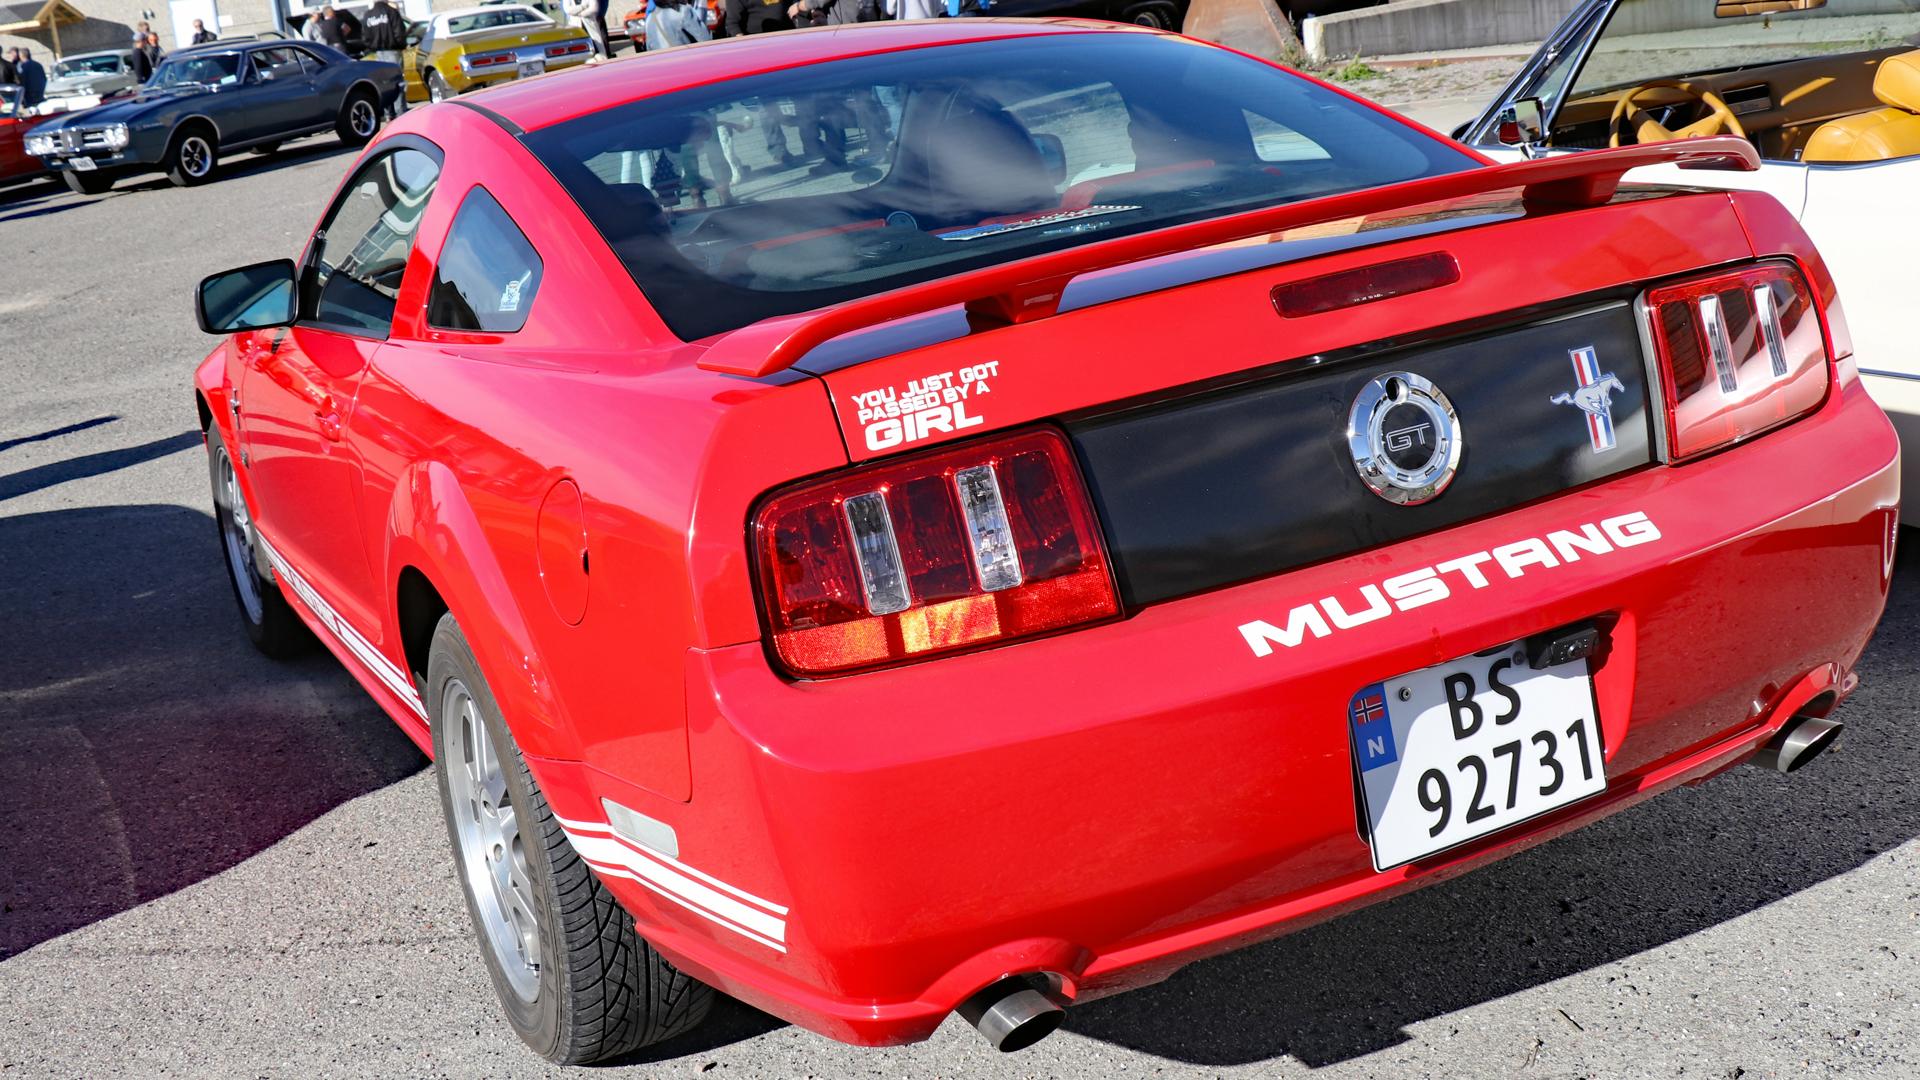 265-2005 Ford Mustang GT 02. Eier- medlem 265 Niko